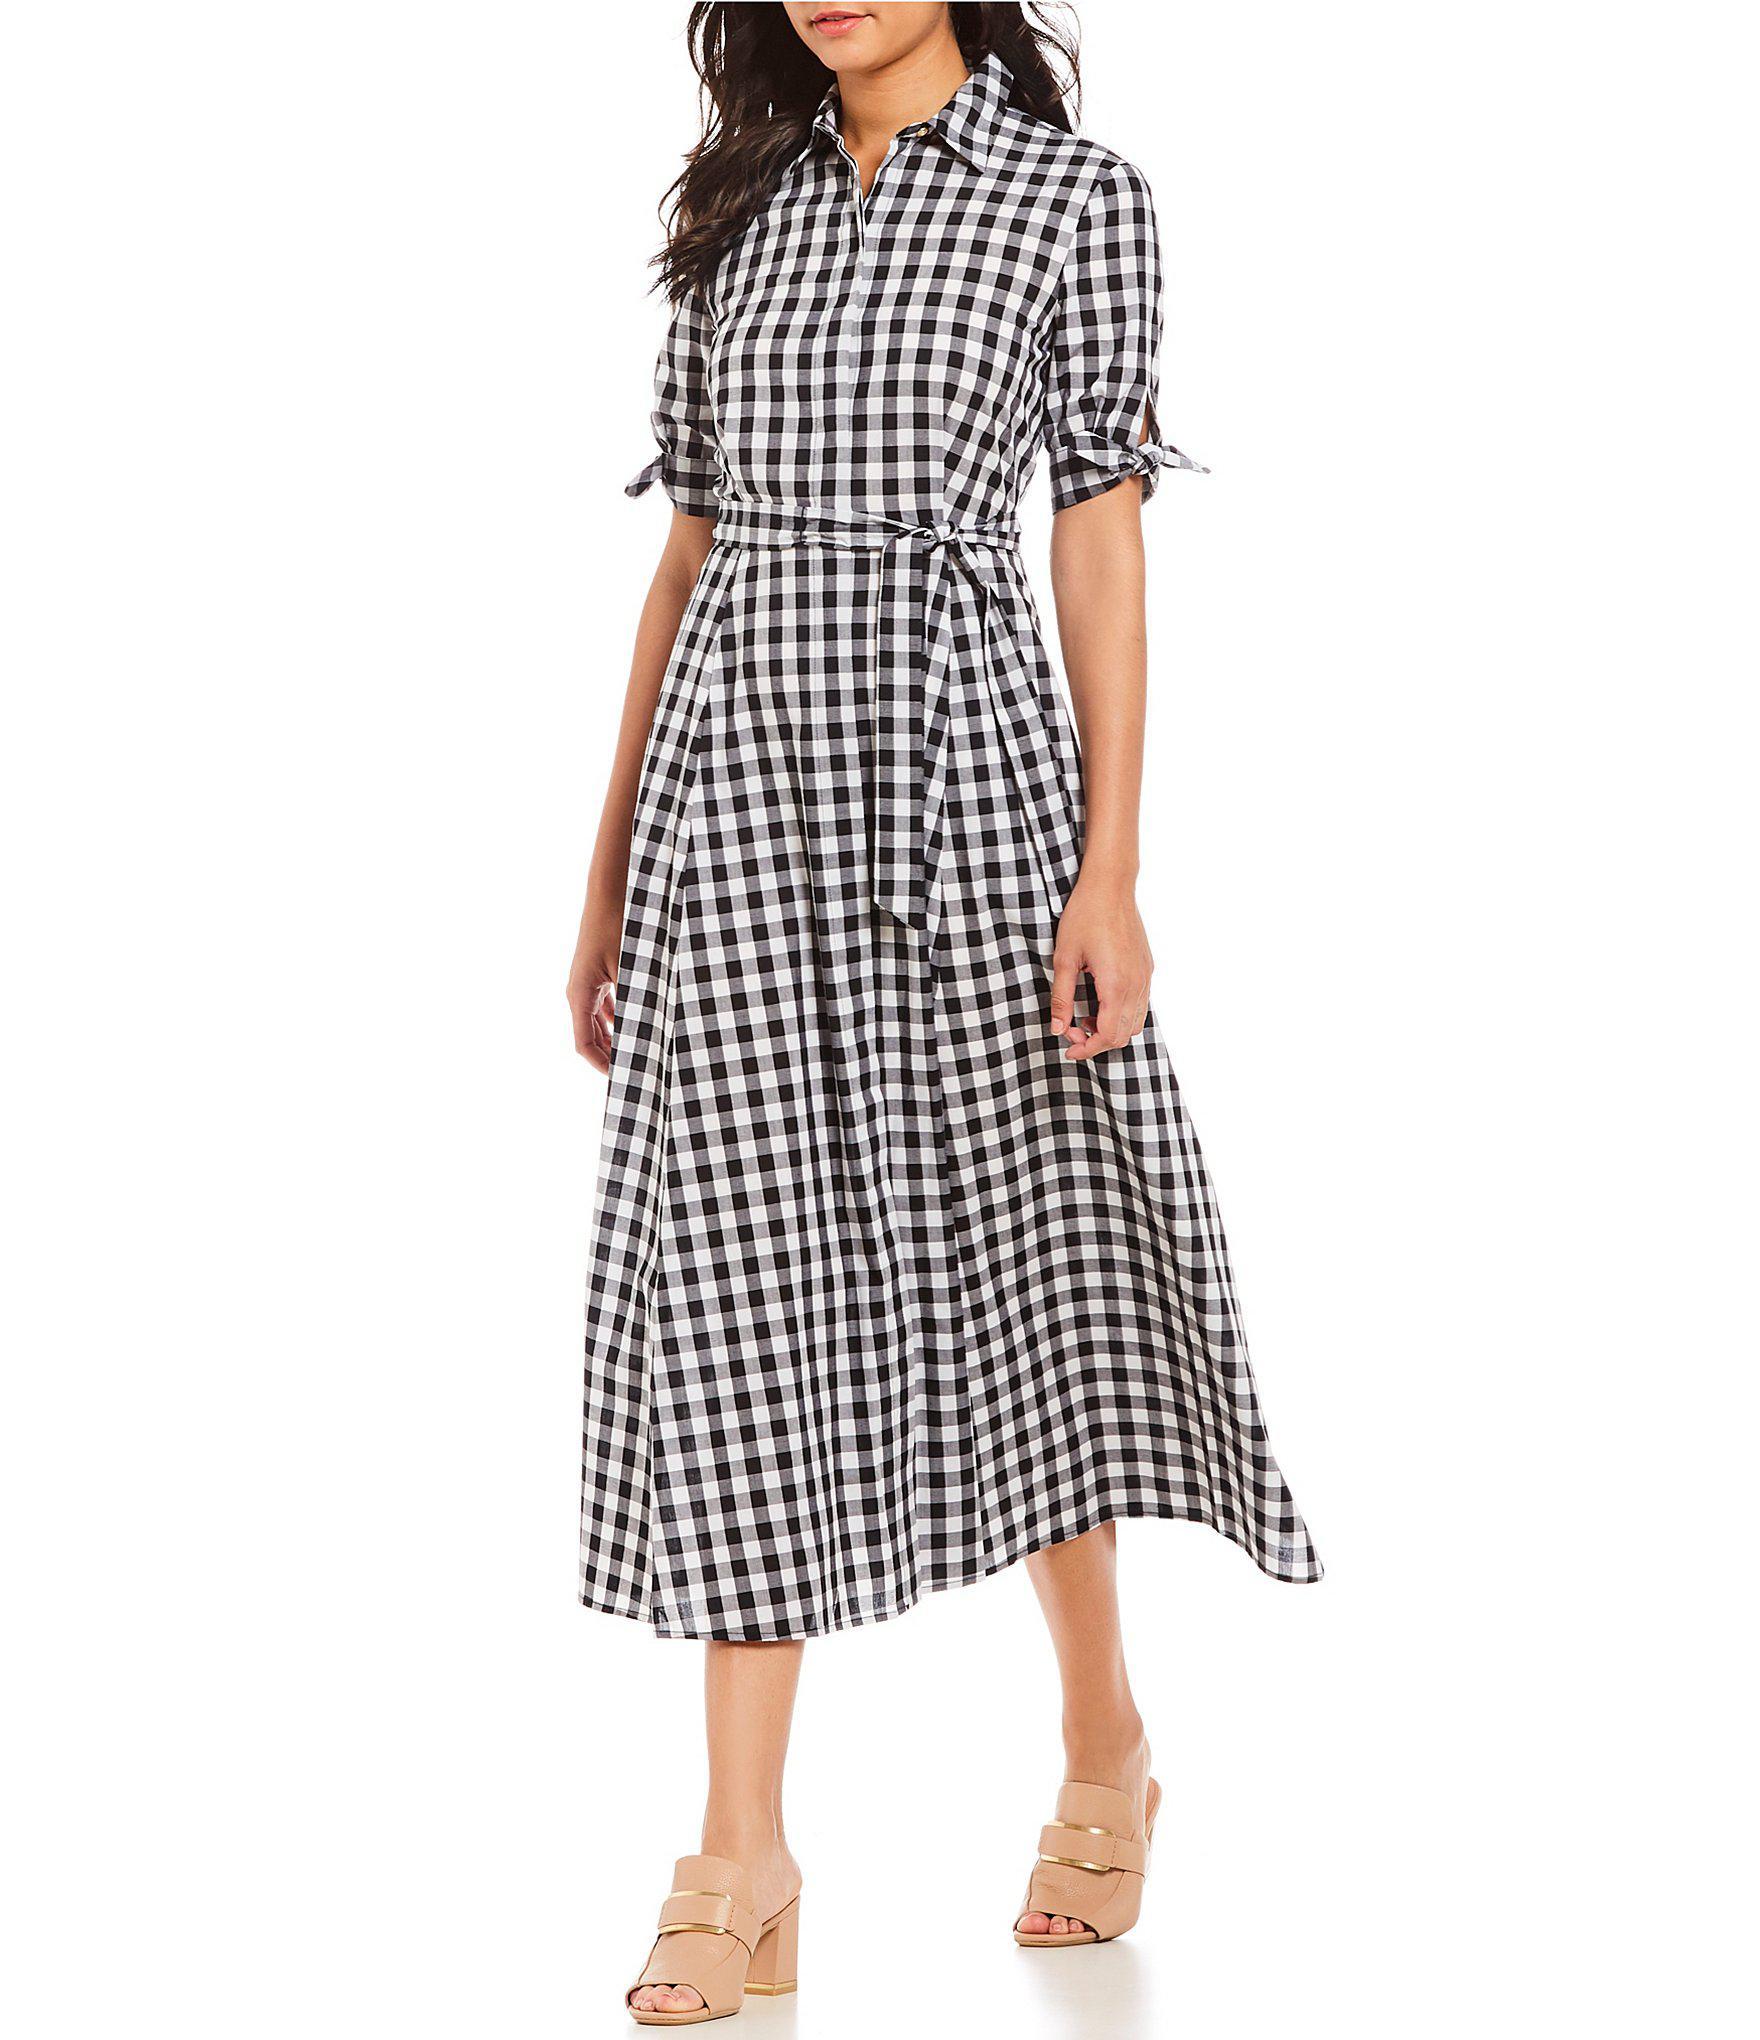 c70bf827f4fd2 Lyst - Calvin Klein Gingham Belted Midi Length Shirt Dress in Black